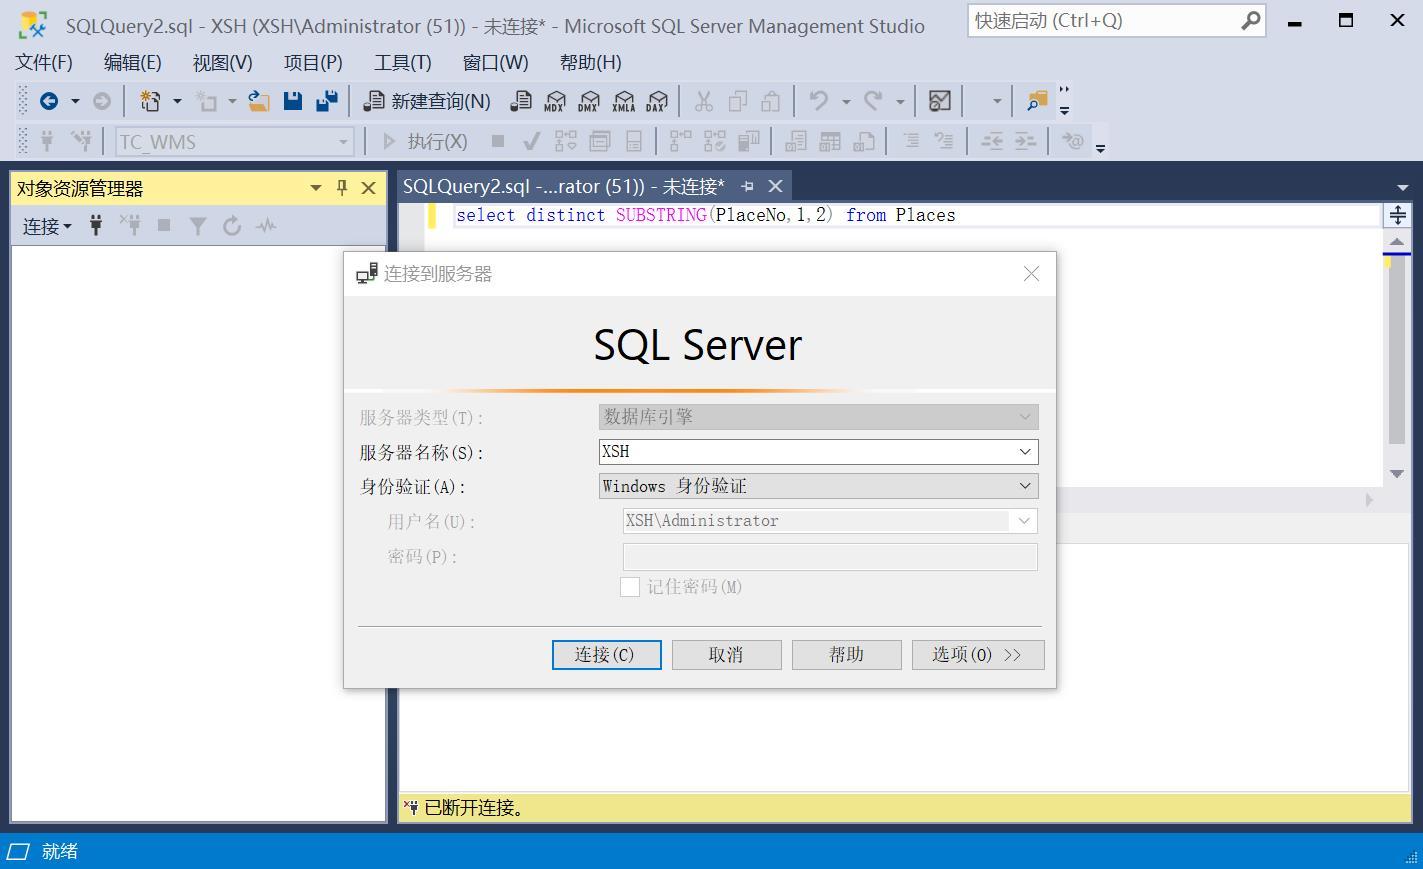 SQL Server Management Studio 18.9.1 多国语言版数据库管理工具